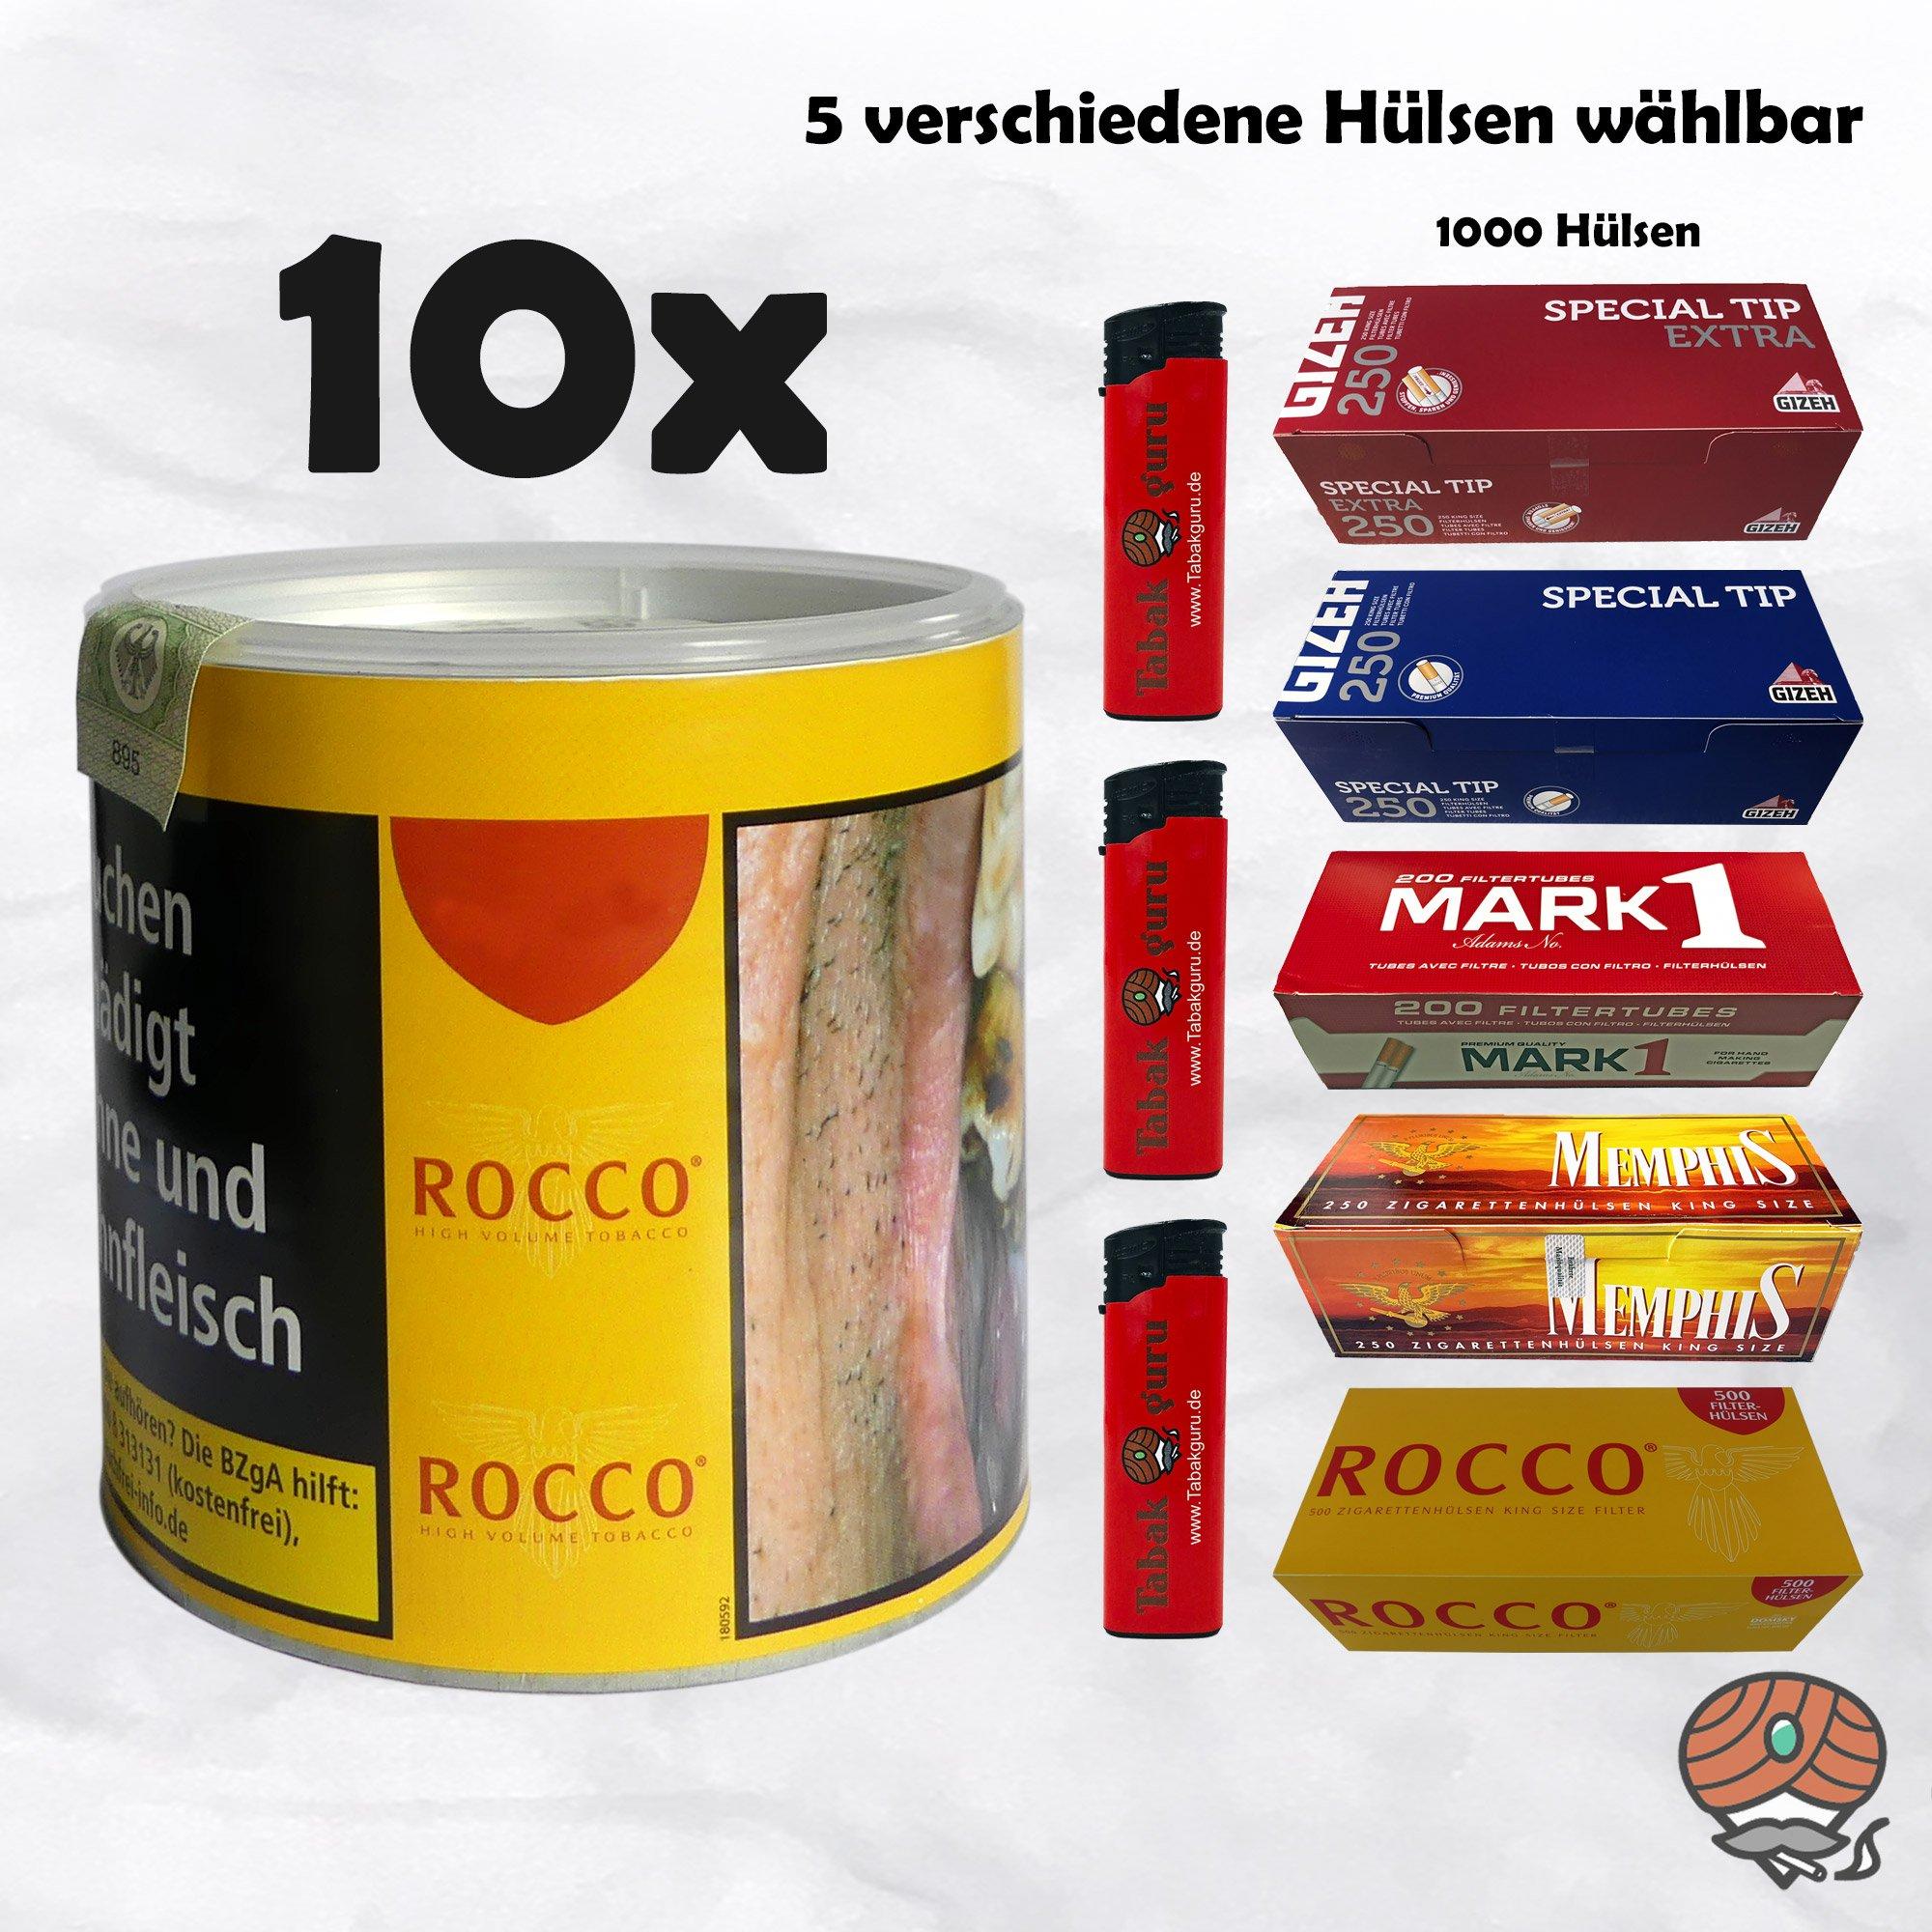 10 x ROCCO Tabak / Volumentabak Gelb Dose 35 g + 1.000 Hülsen wählbar